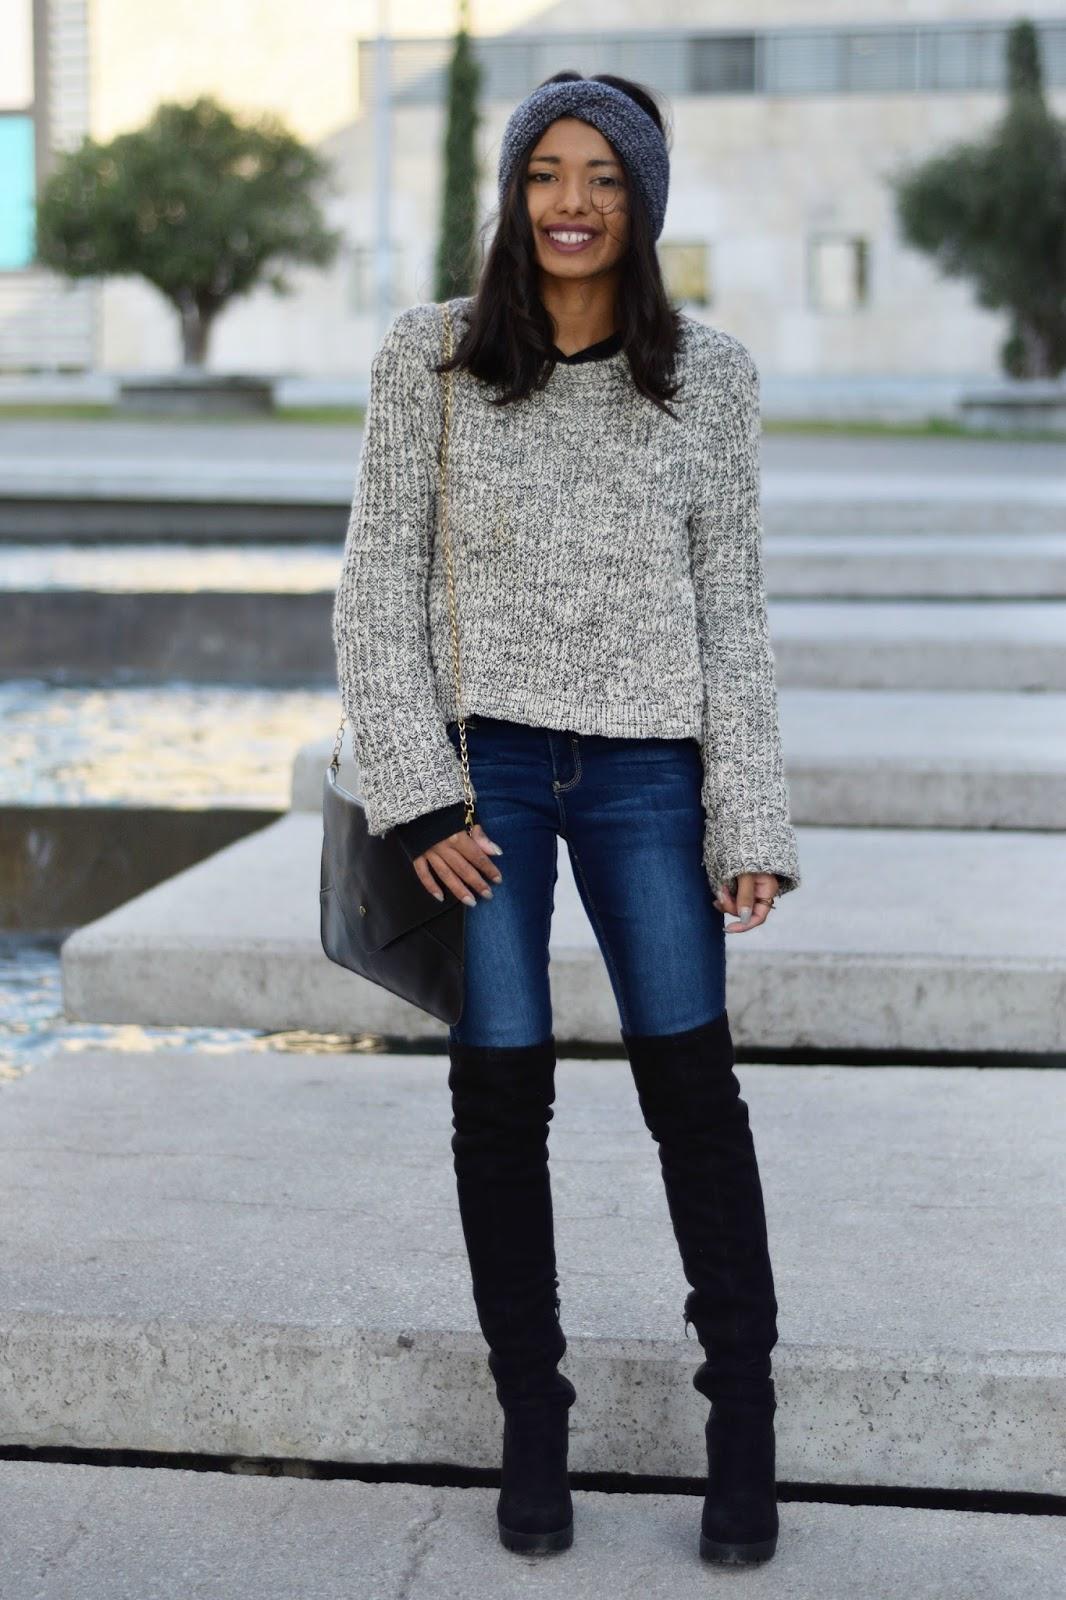 Plexida Turban Ymi jeans Black Thigh boots